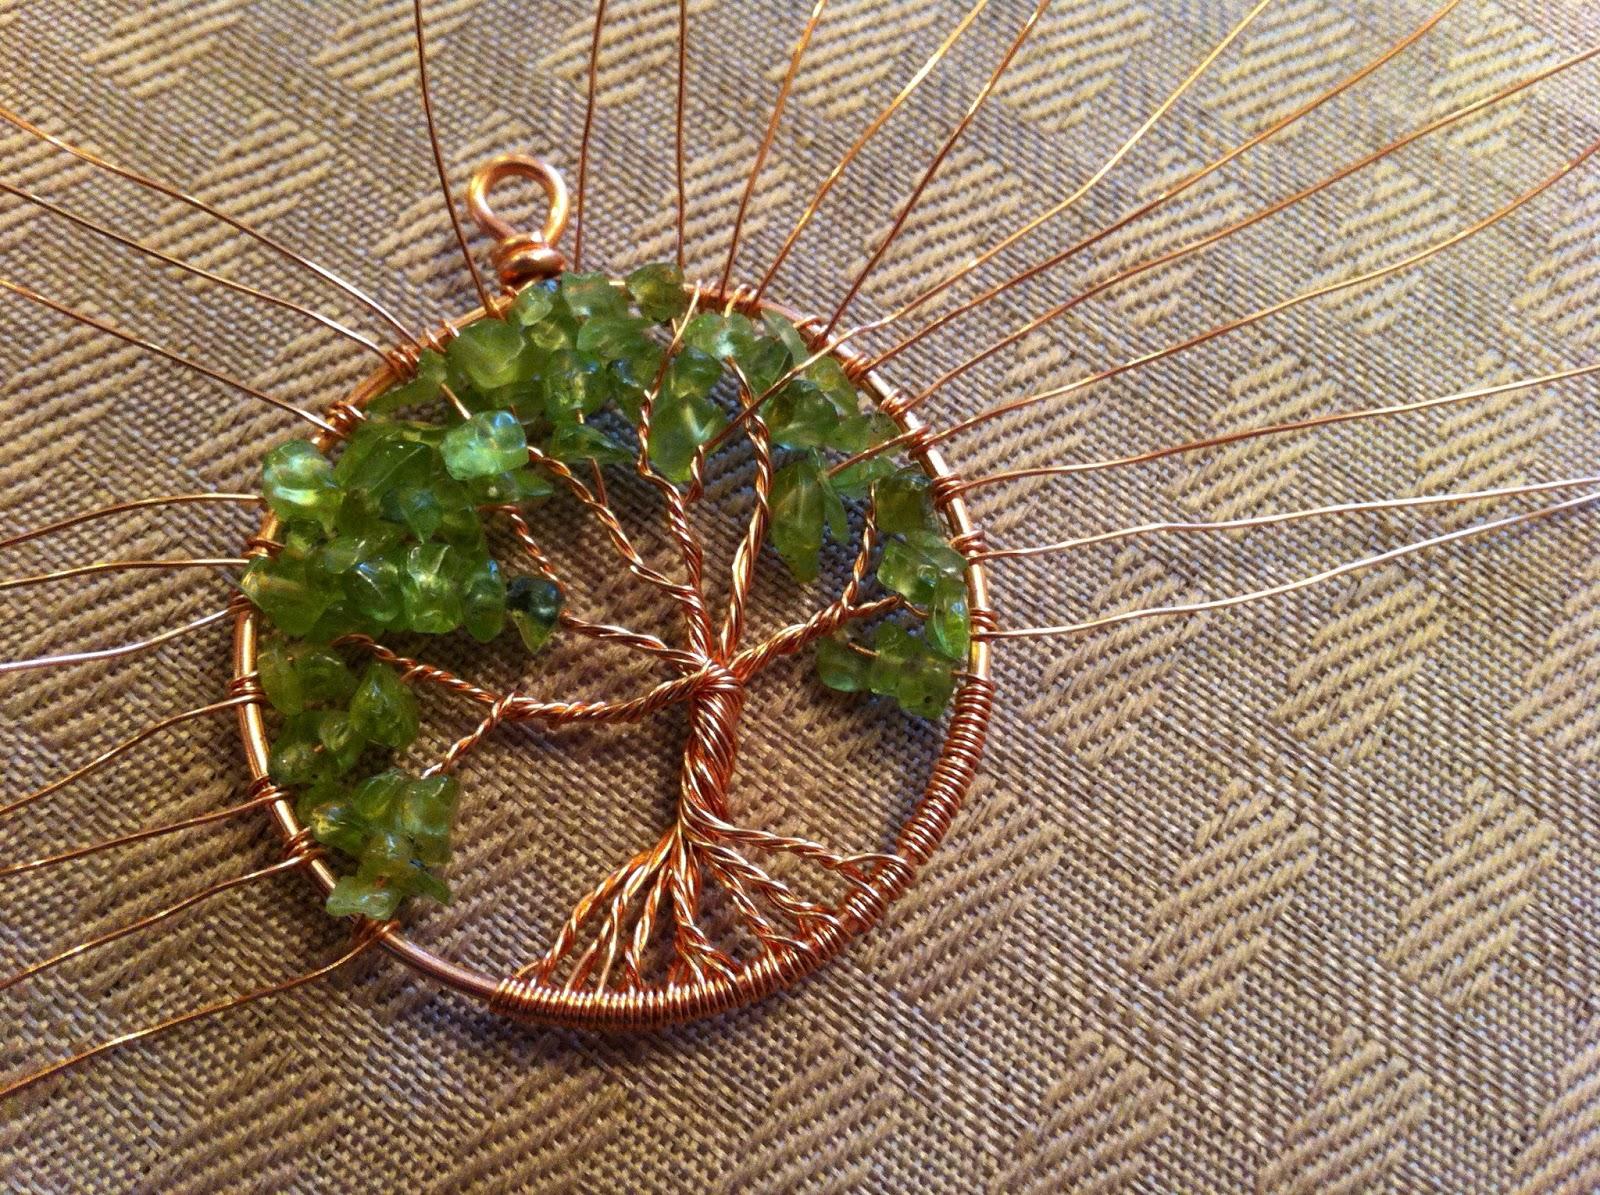 Diy Wire Tree Life Wiring Diagrams Ez Go Golf Cart Diagram Electric System Binatanicom Images Gallery